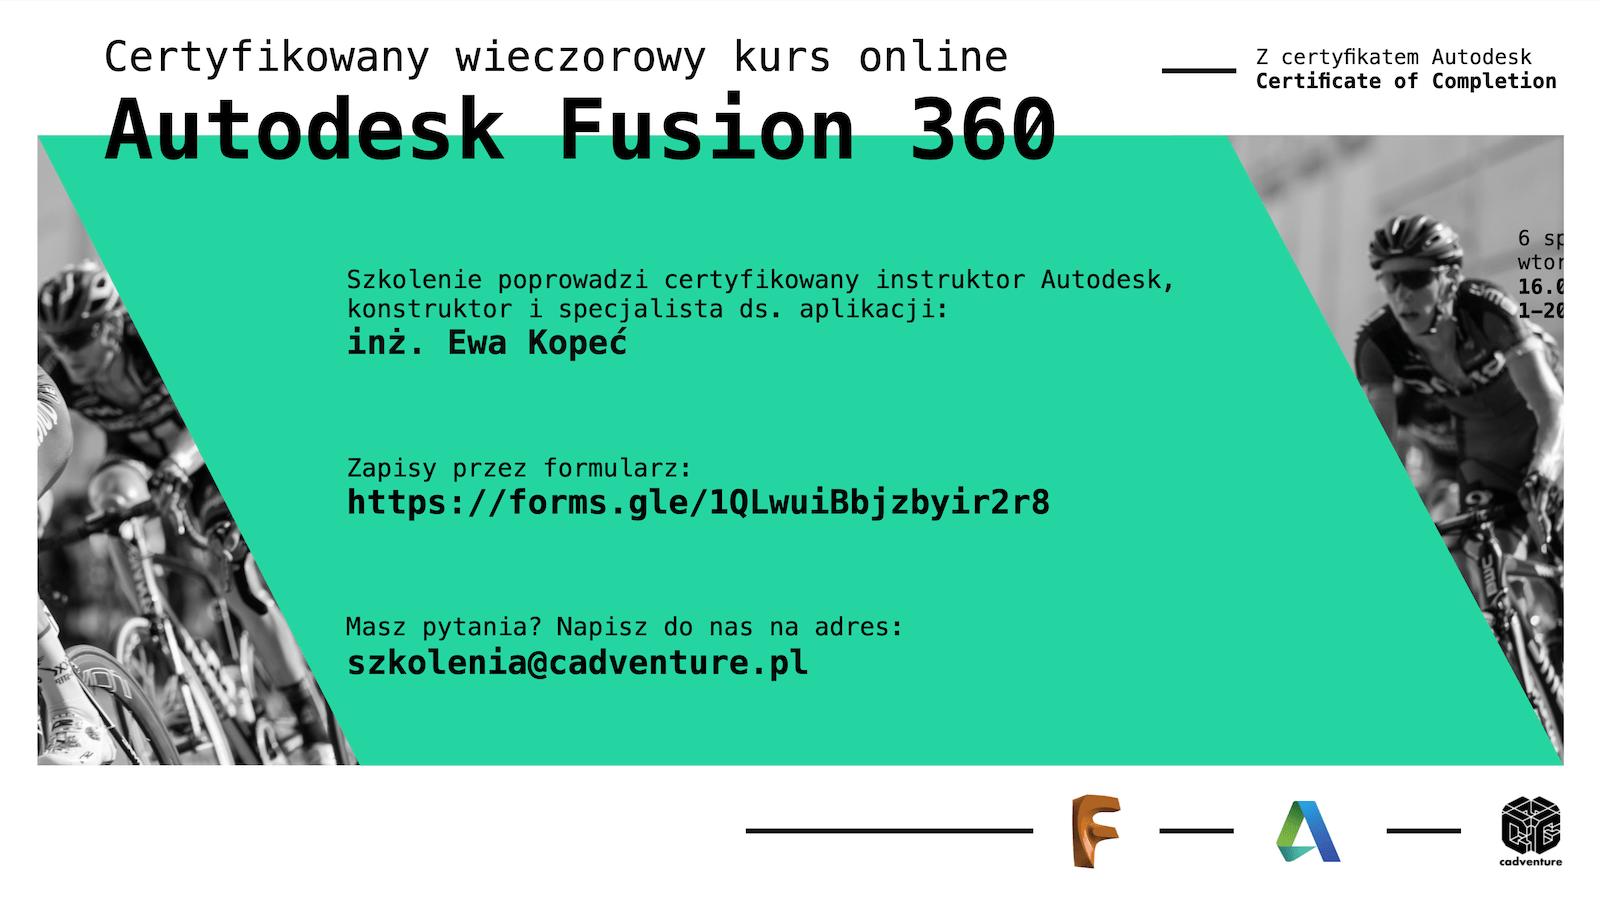 cadventure.pl - fusion360 - kurs - 6